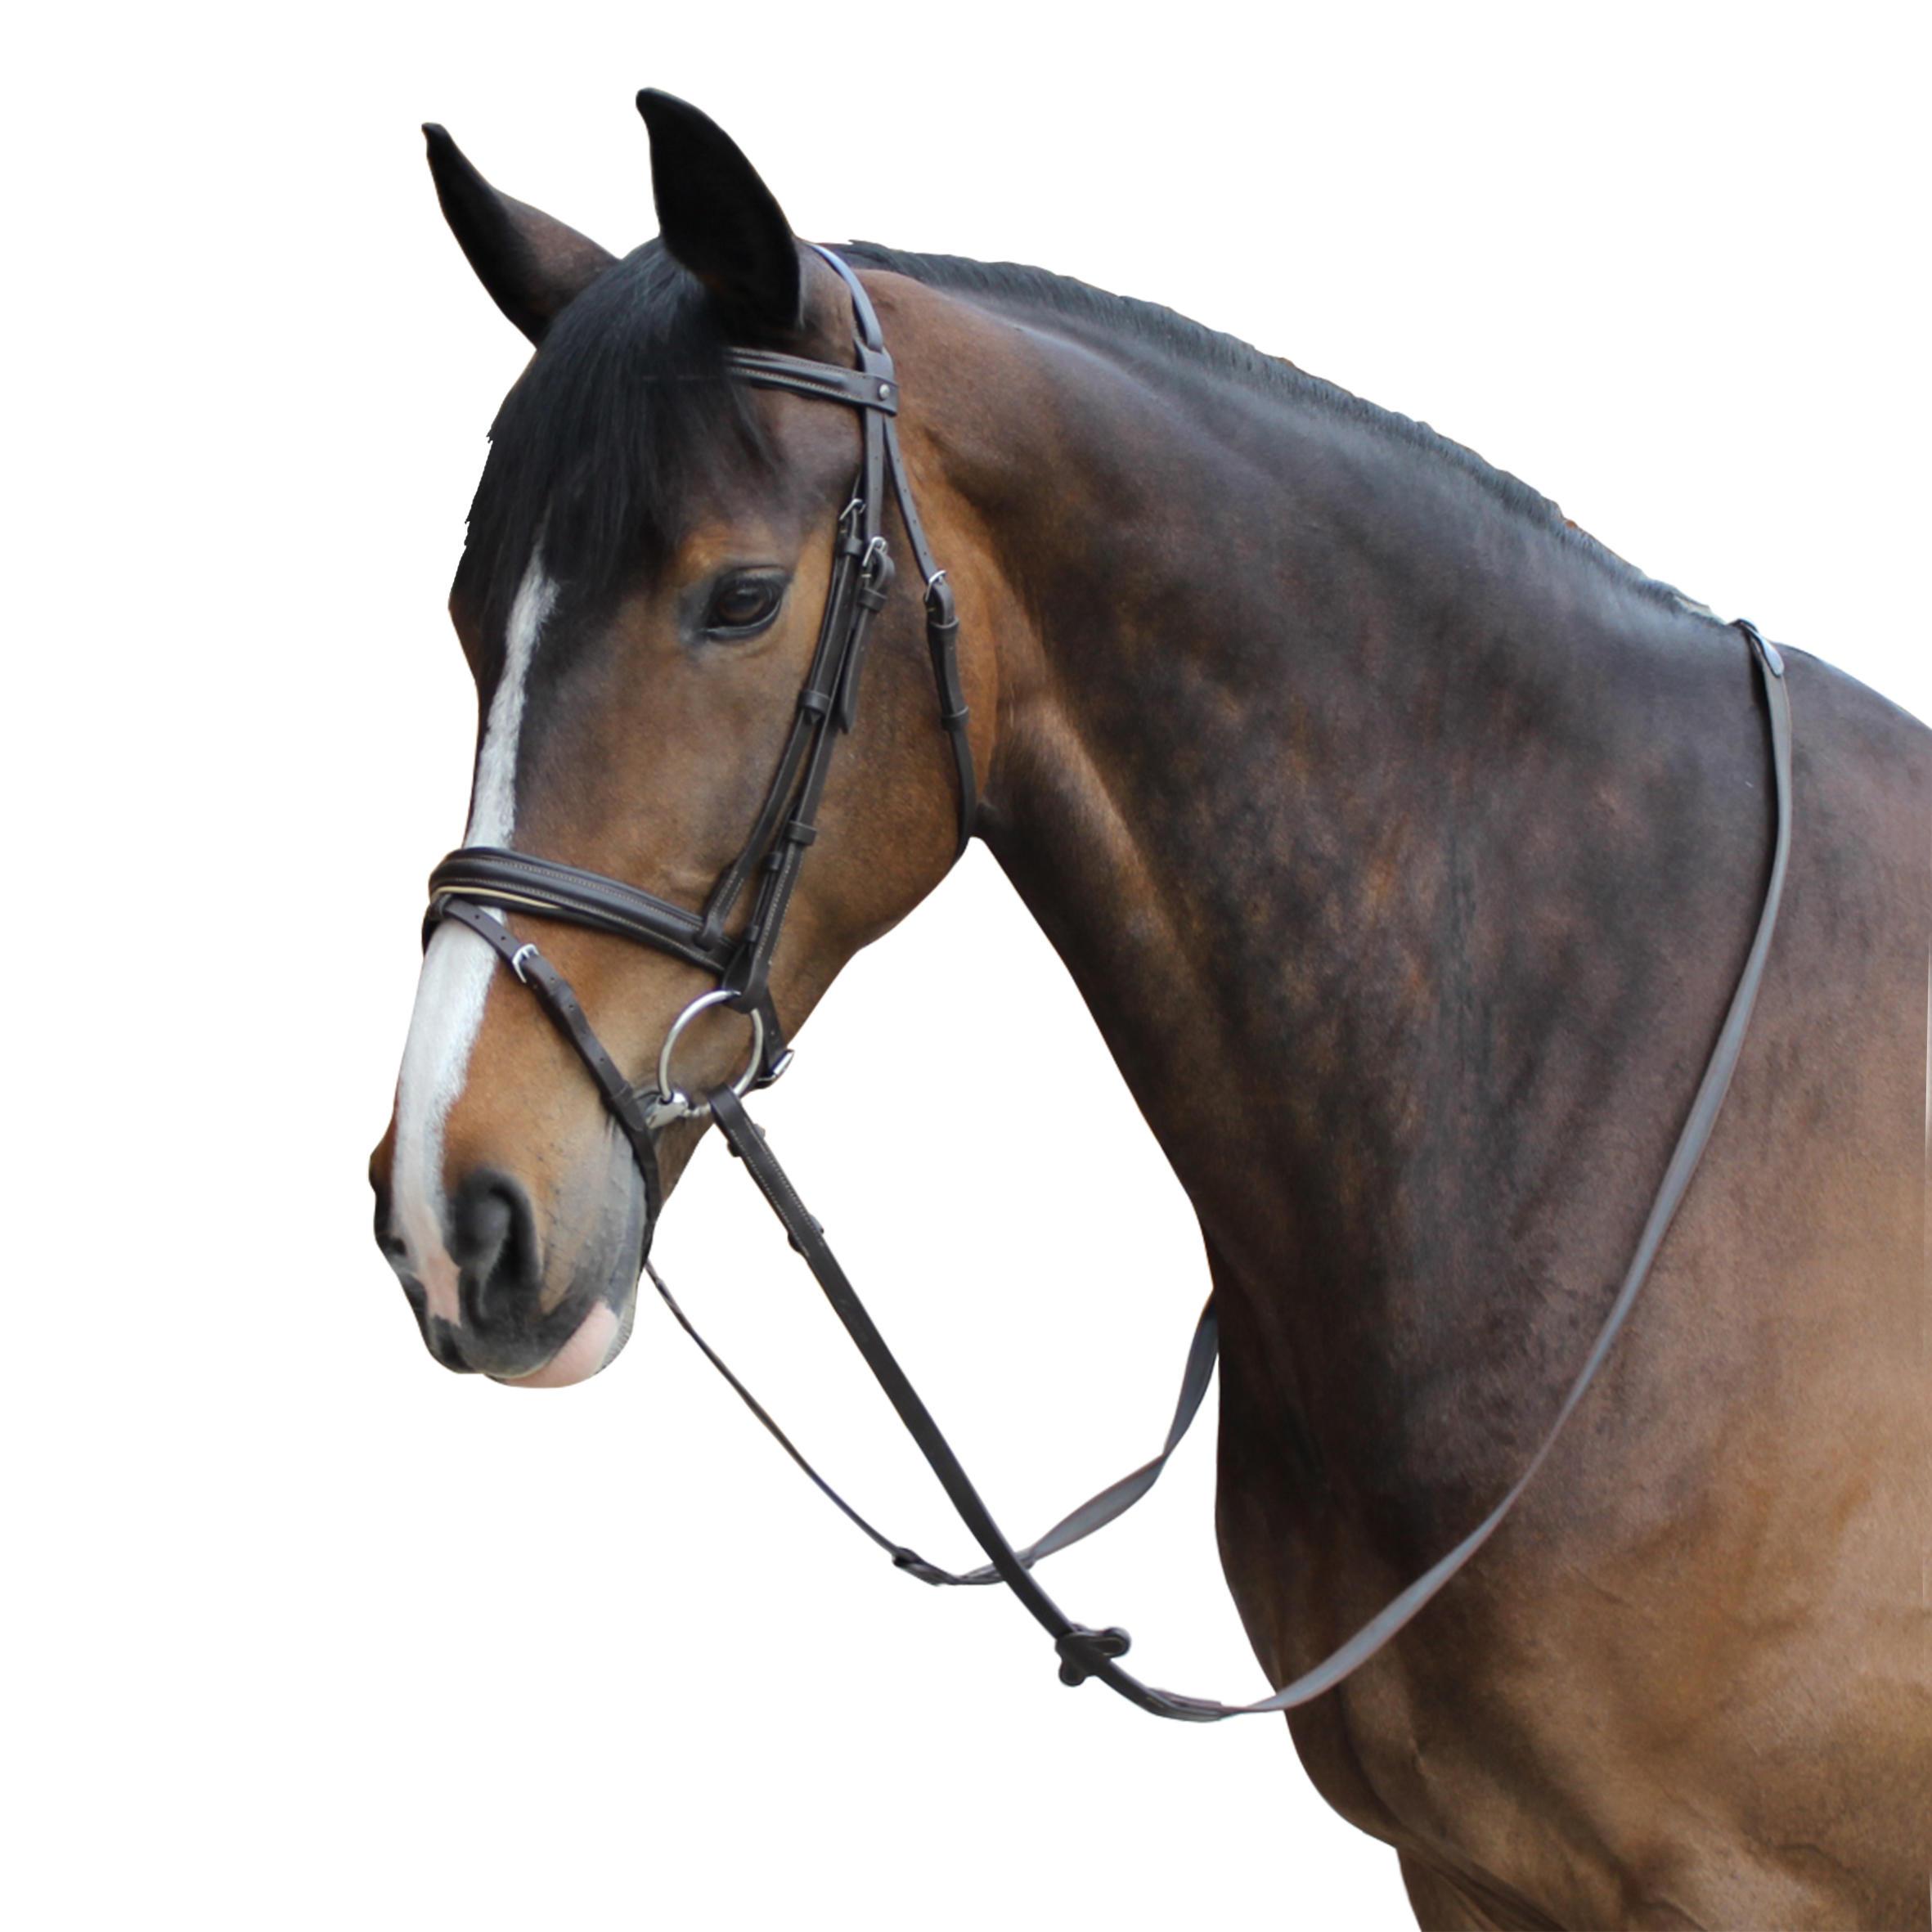 Edinburgh Horseback and Pony Riding Bridle and Reins - Brown